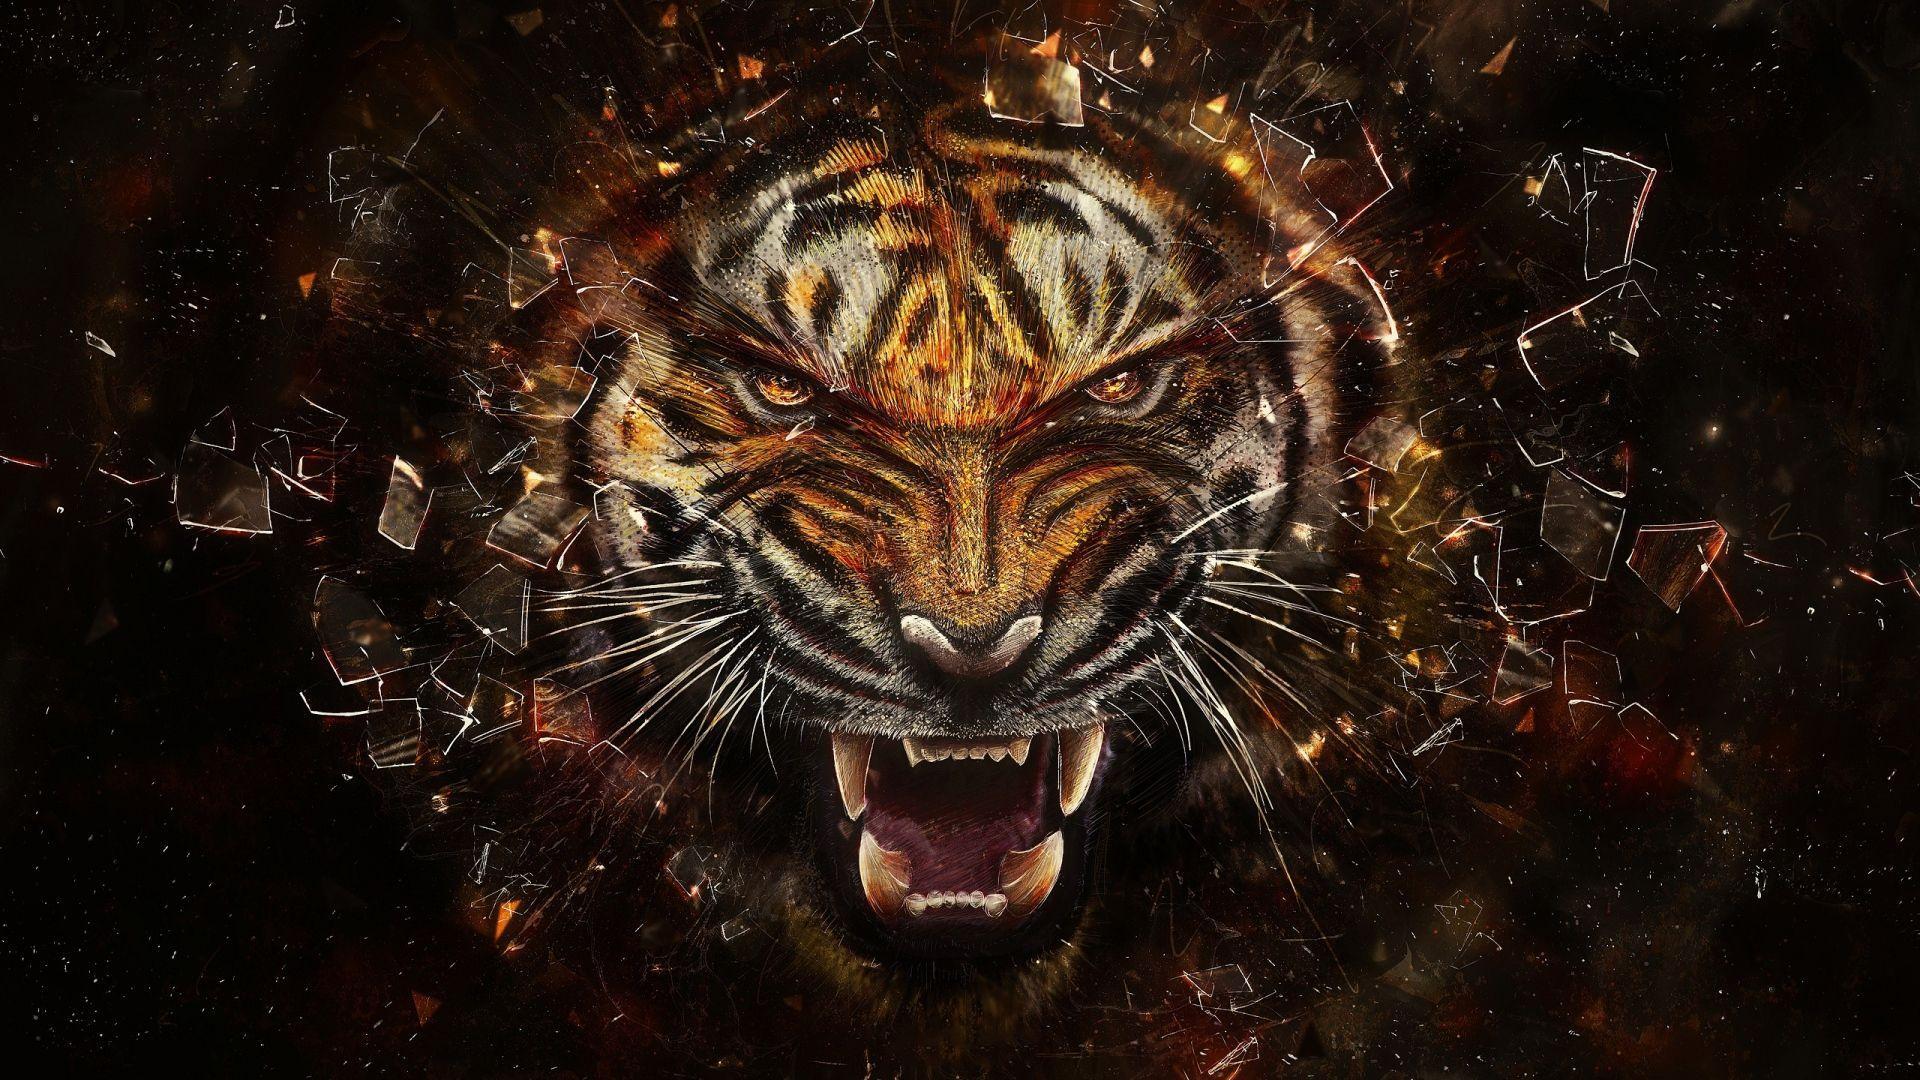 Tiger Vs Dragon Wallpapers Top Free Tiger Vs Dragon Backgrounds